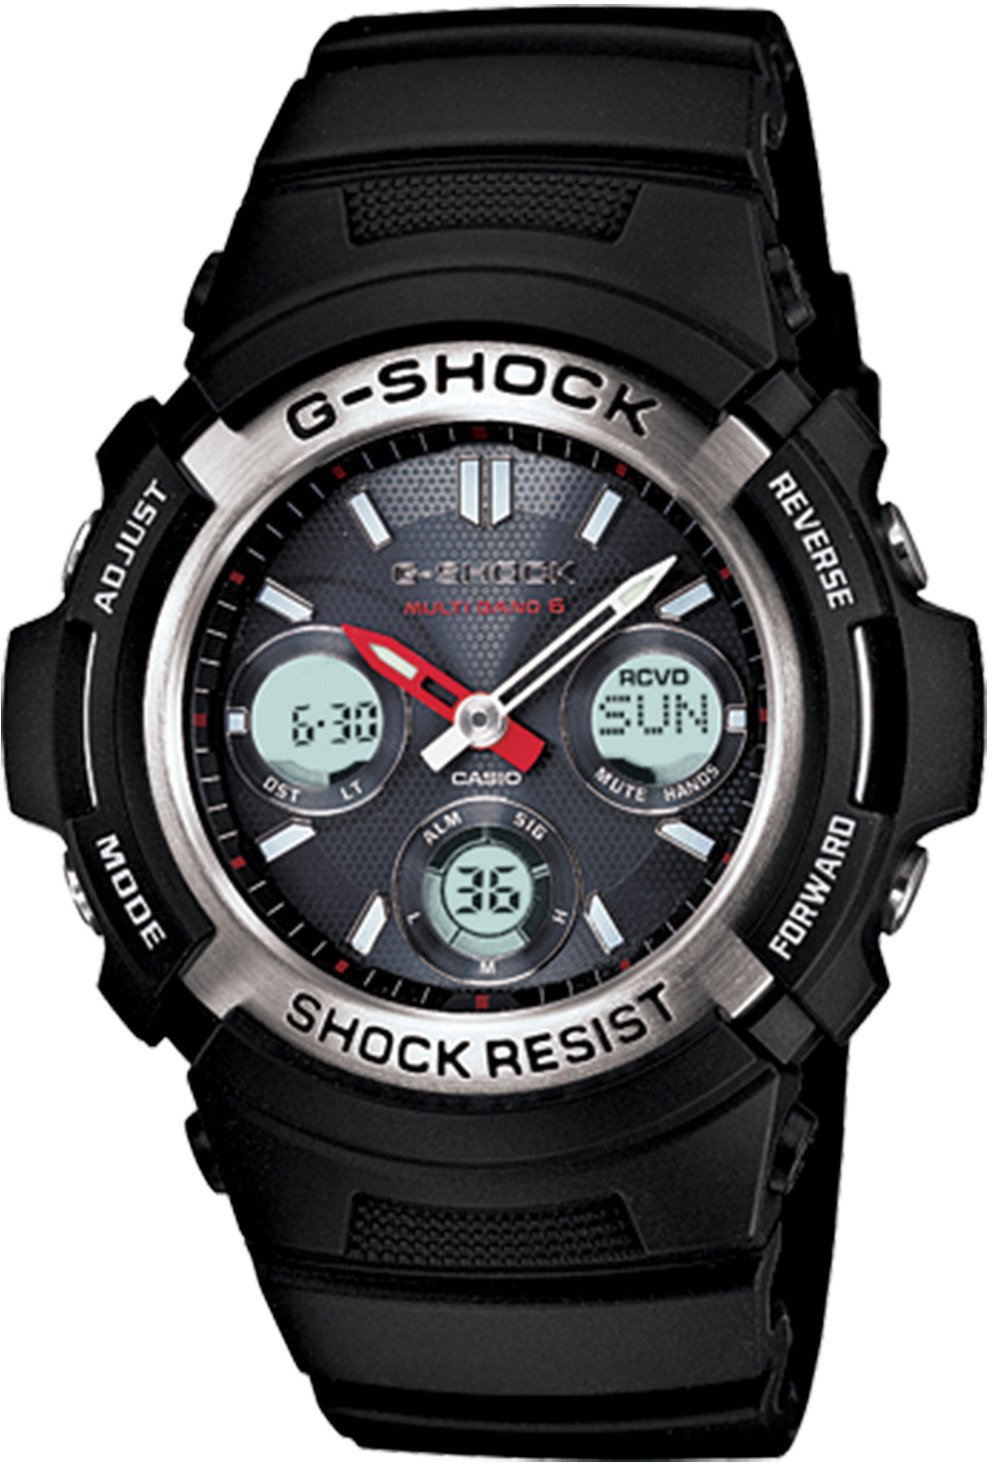 ca7a098d8129 Casio Men s G-Shock Analog Digital Watch